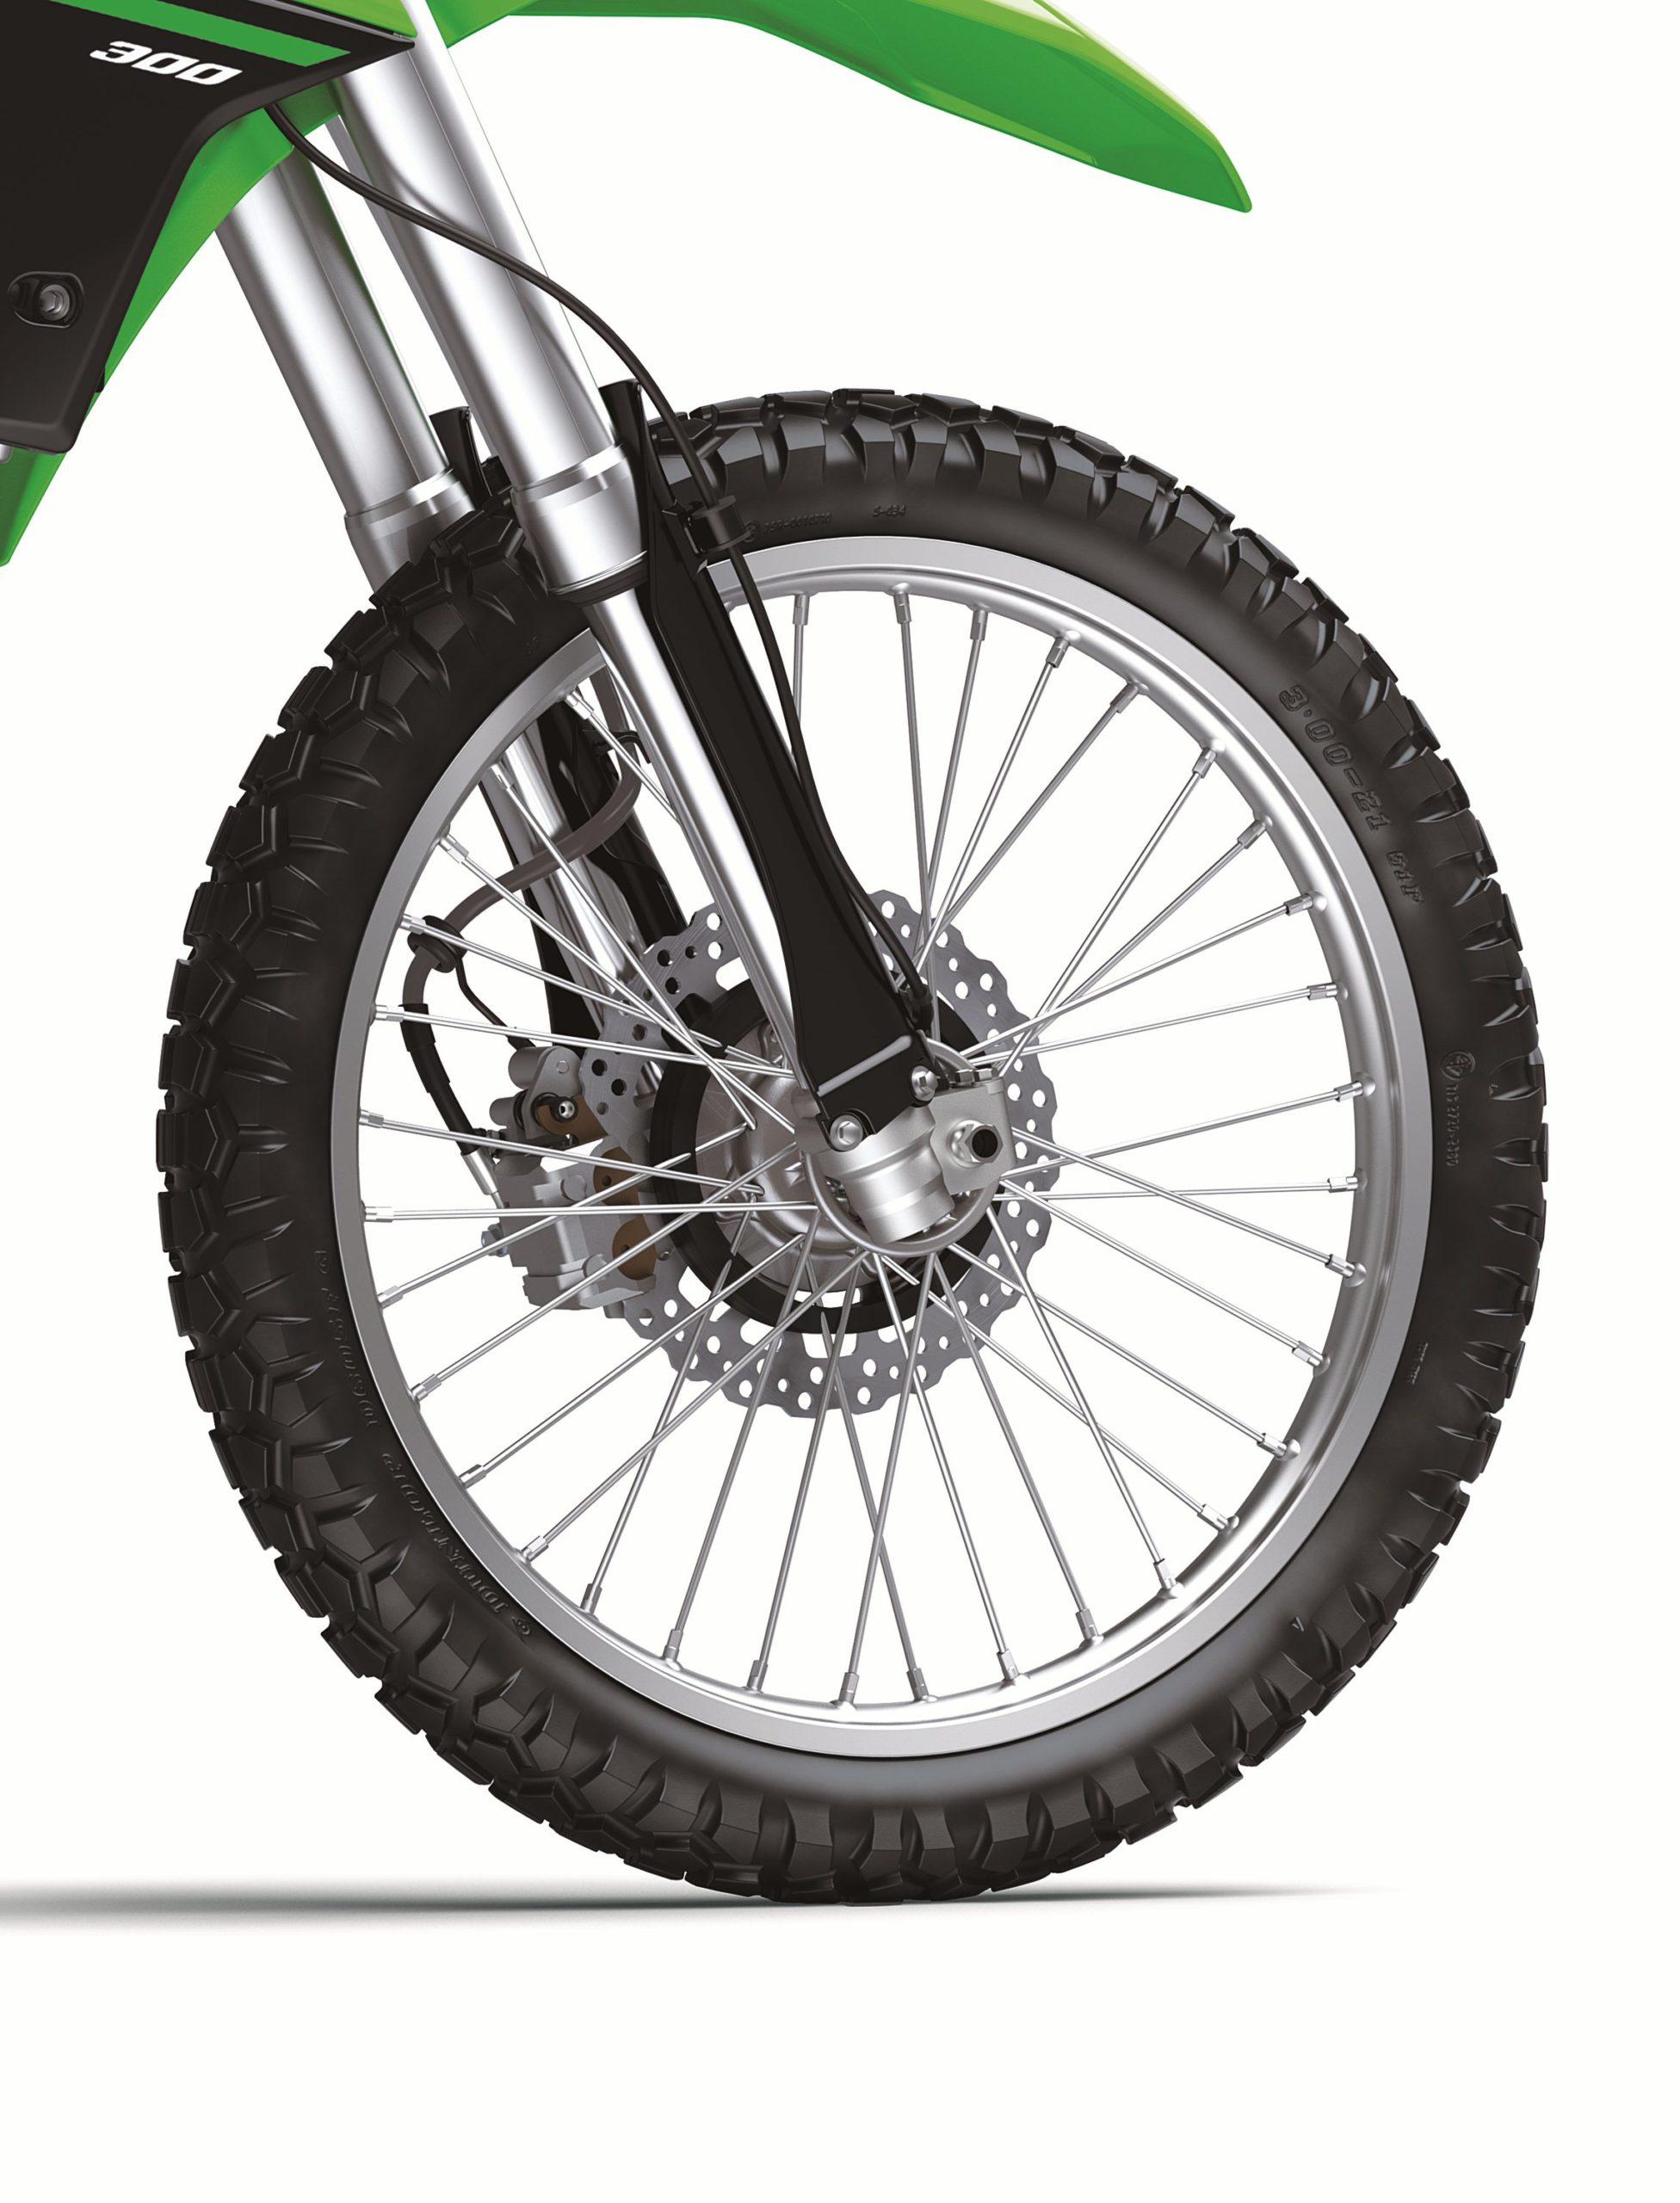 KLX300 front wheel